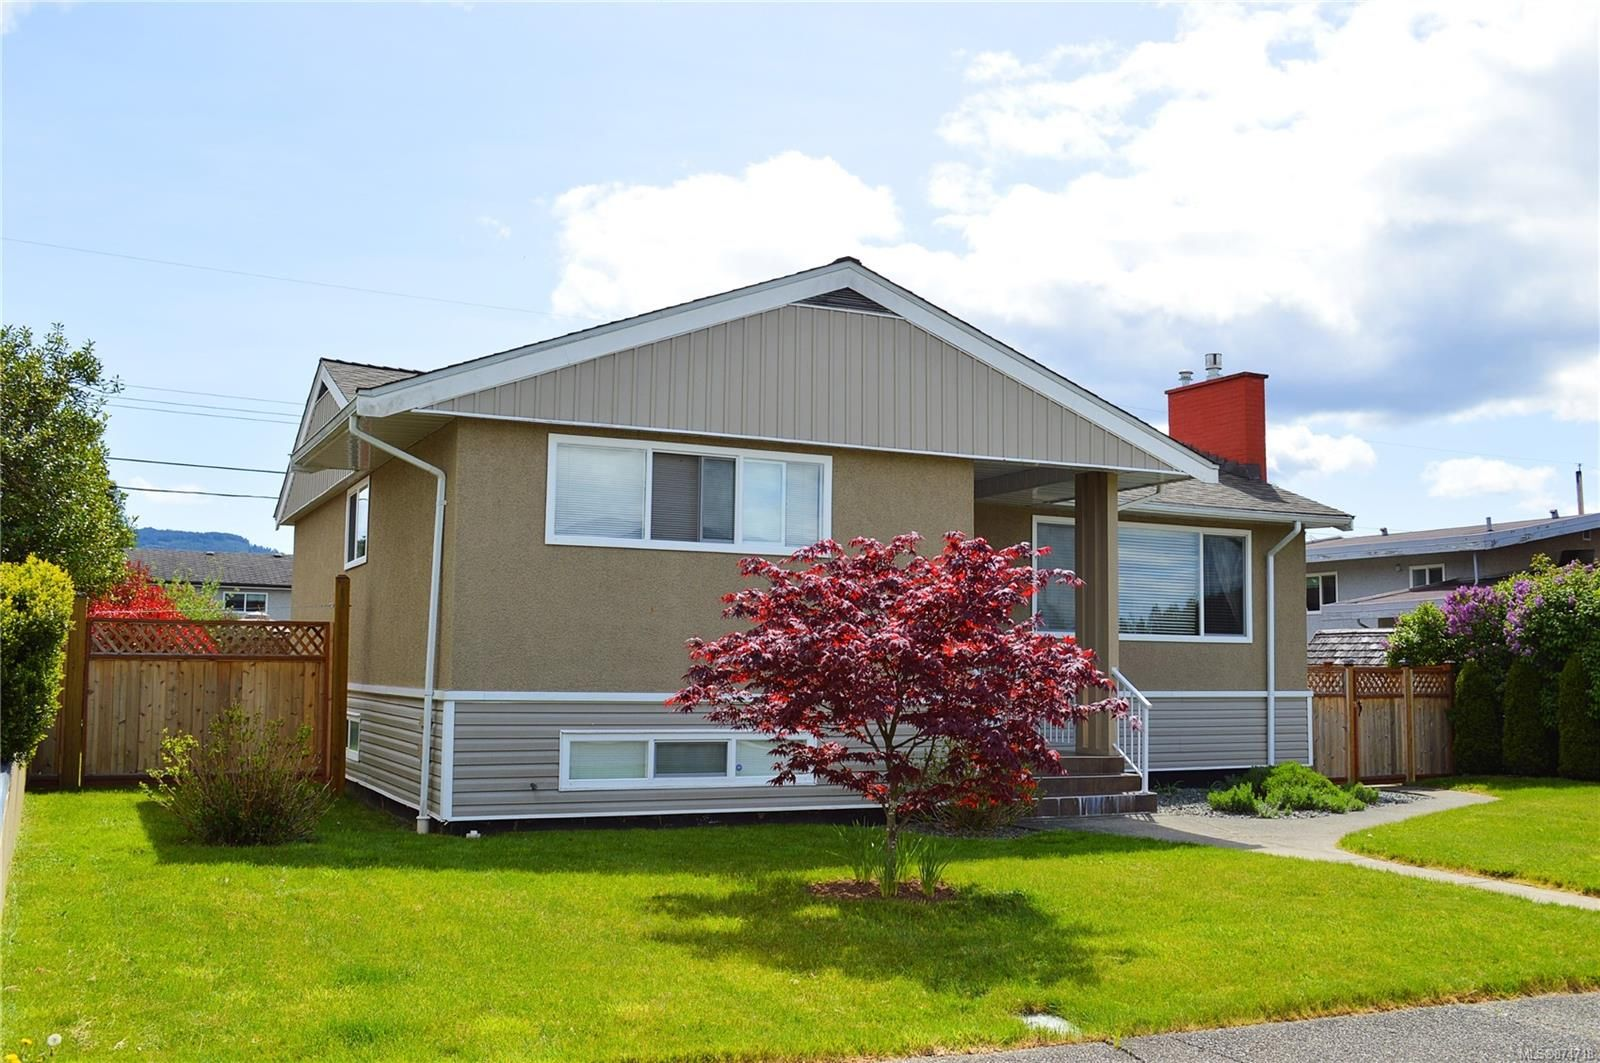 Main Photo: 3910 Exton St in : PA Port Alberni House for sale (Port Alberni)  : MLS®# 874718